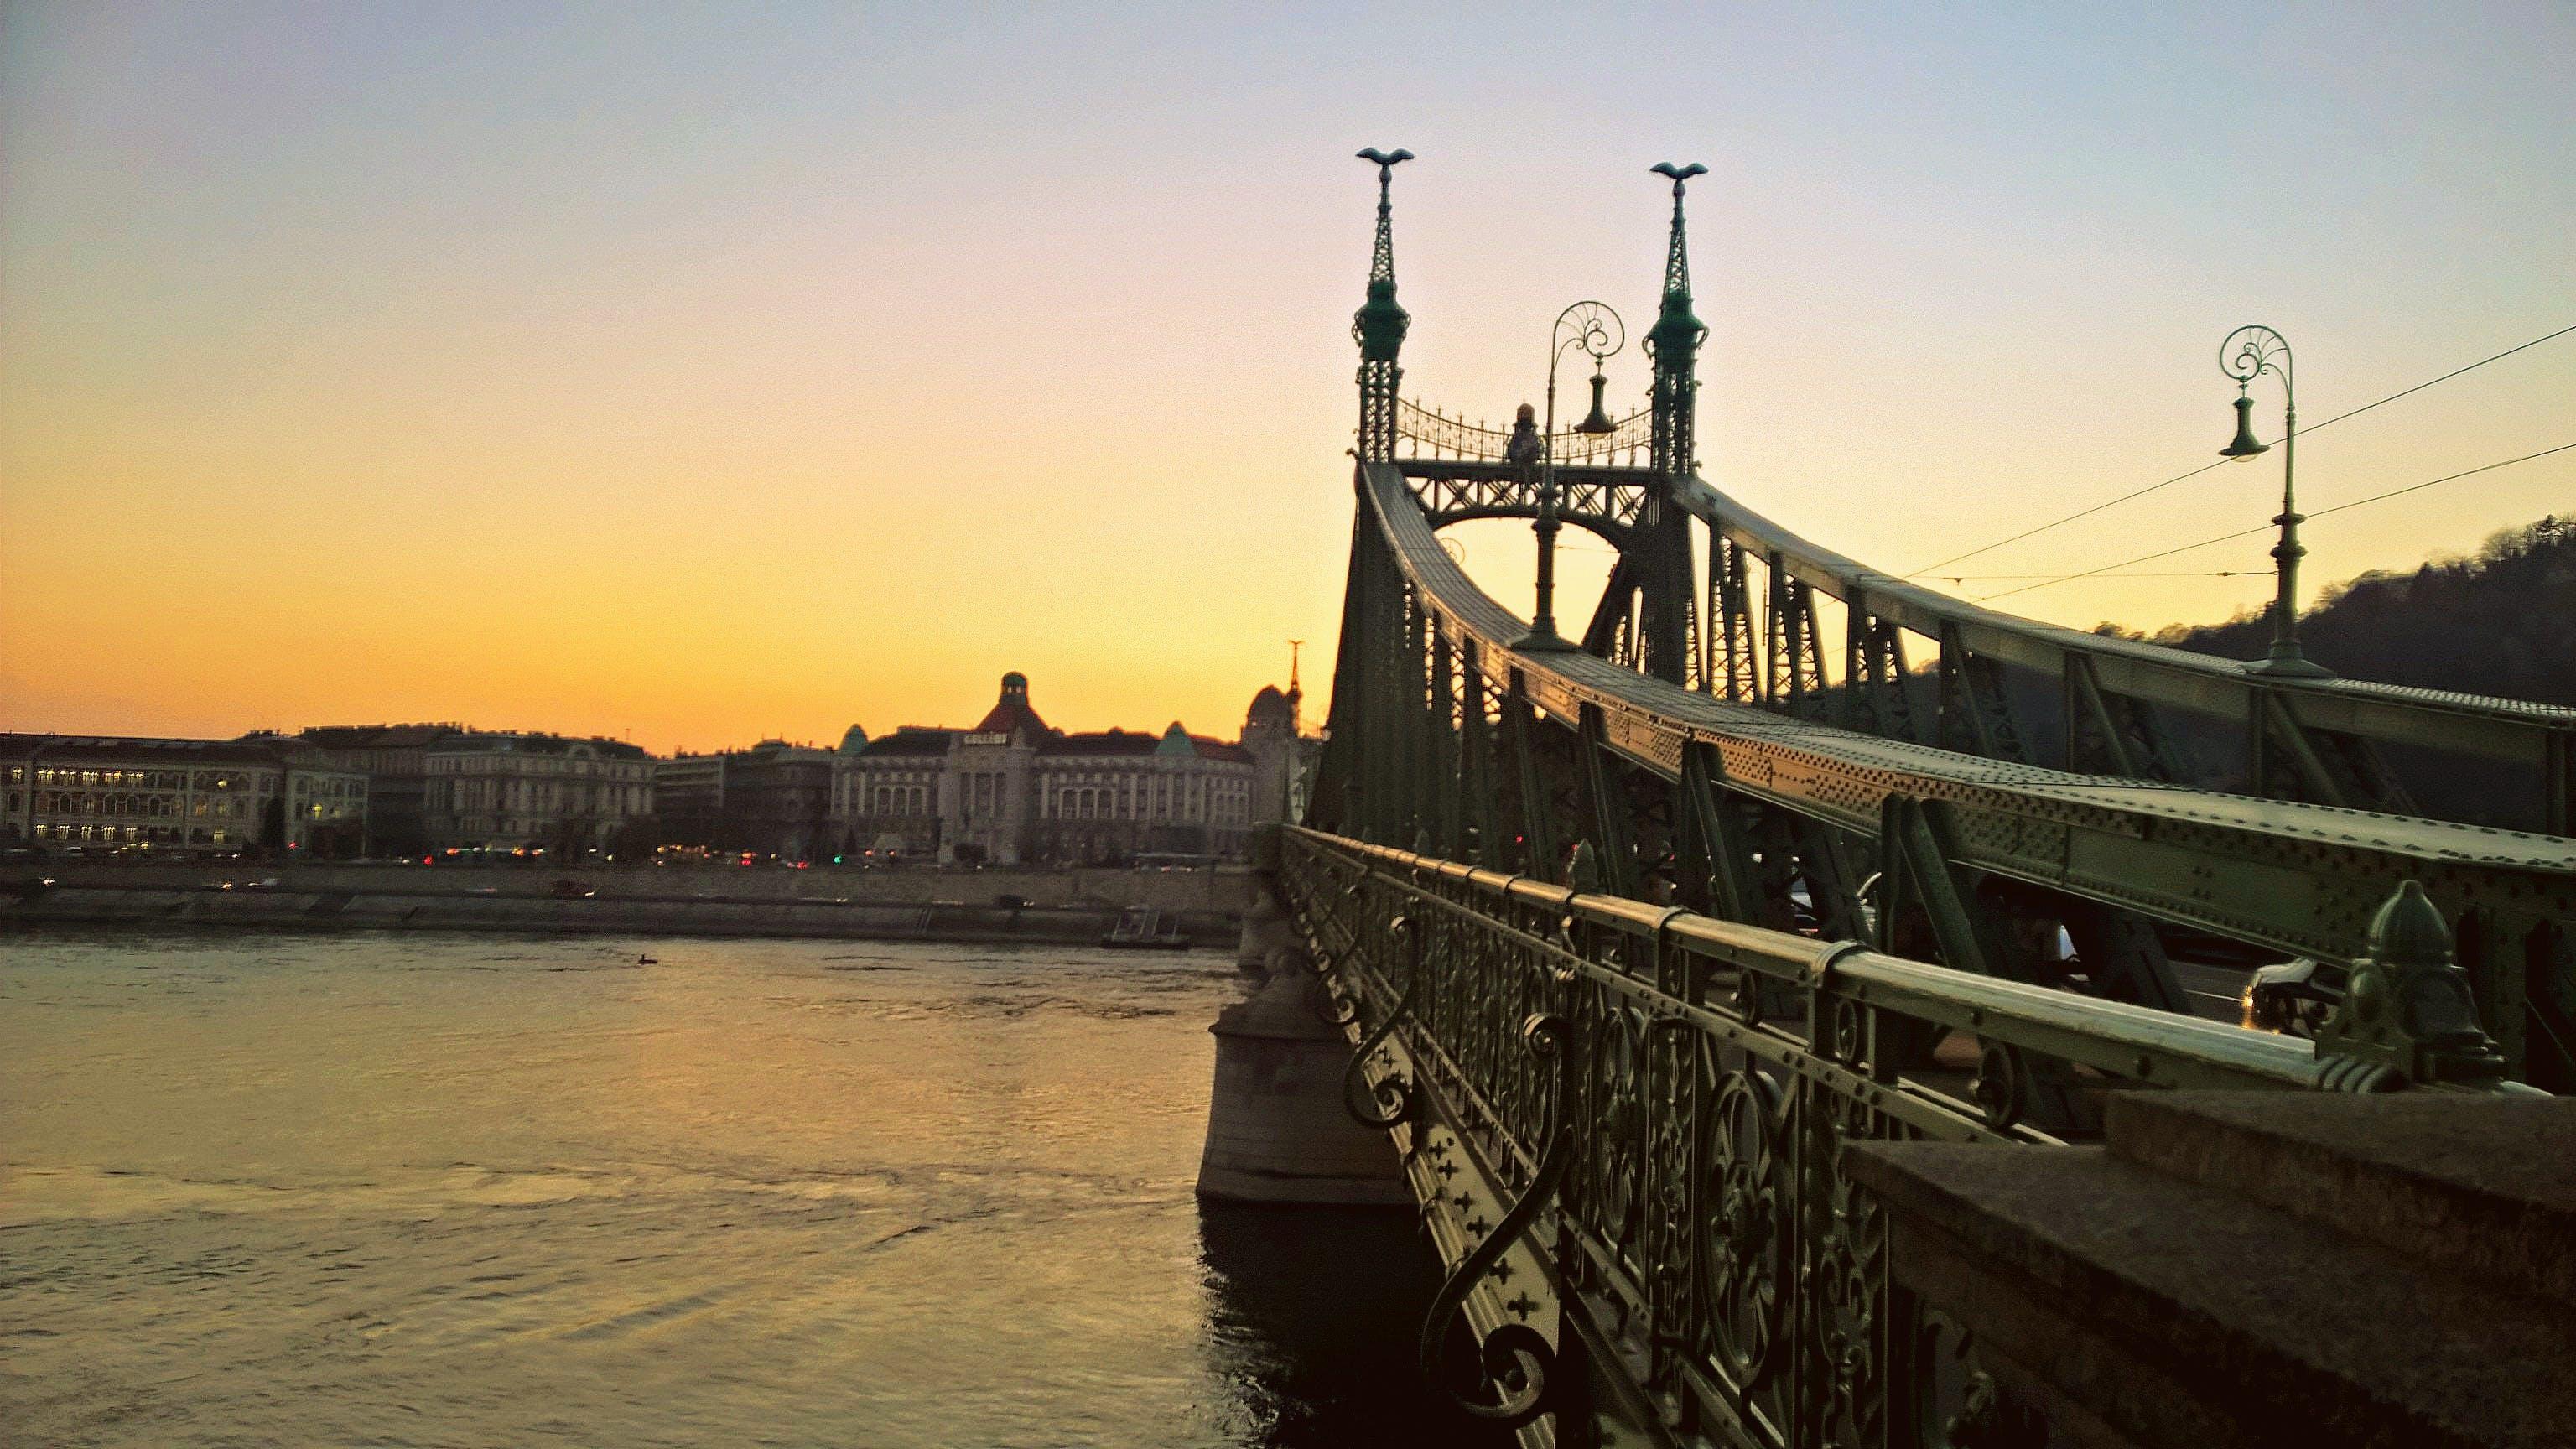 Free stock photo of sunset, architecture, urban, hungary